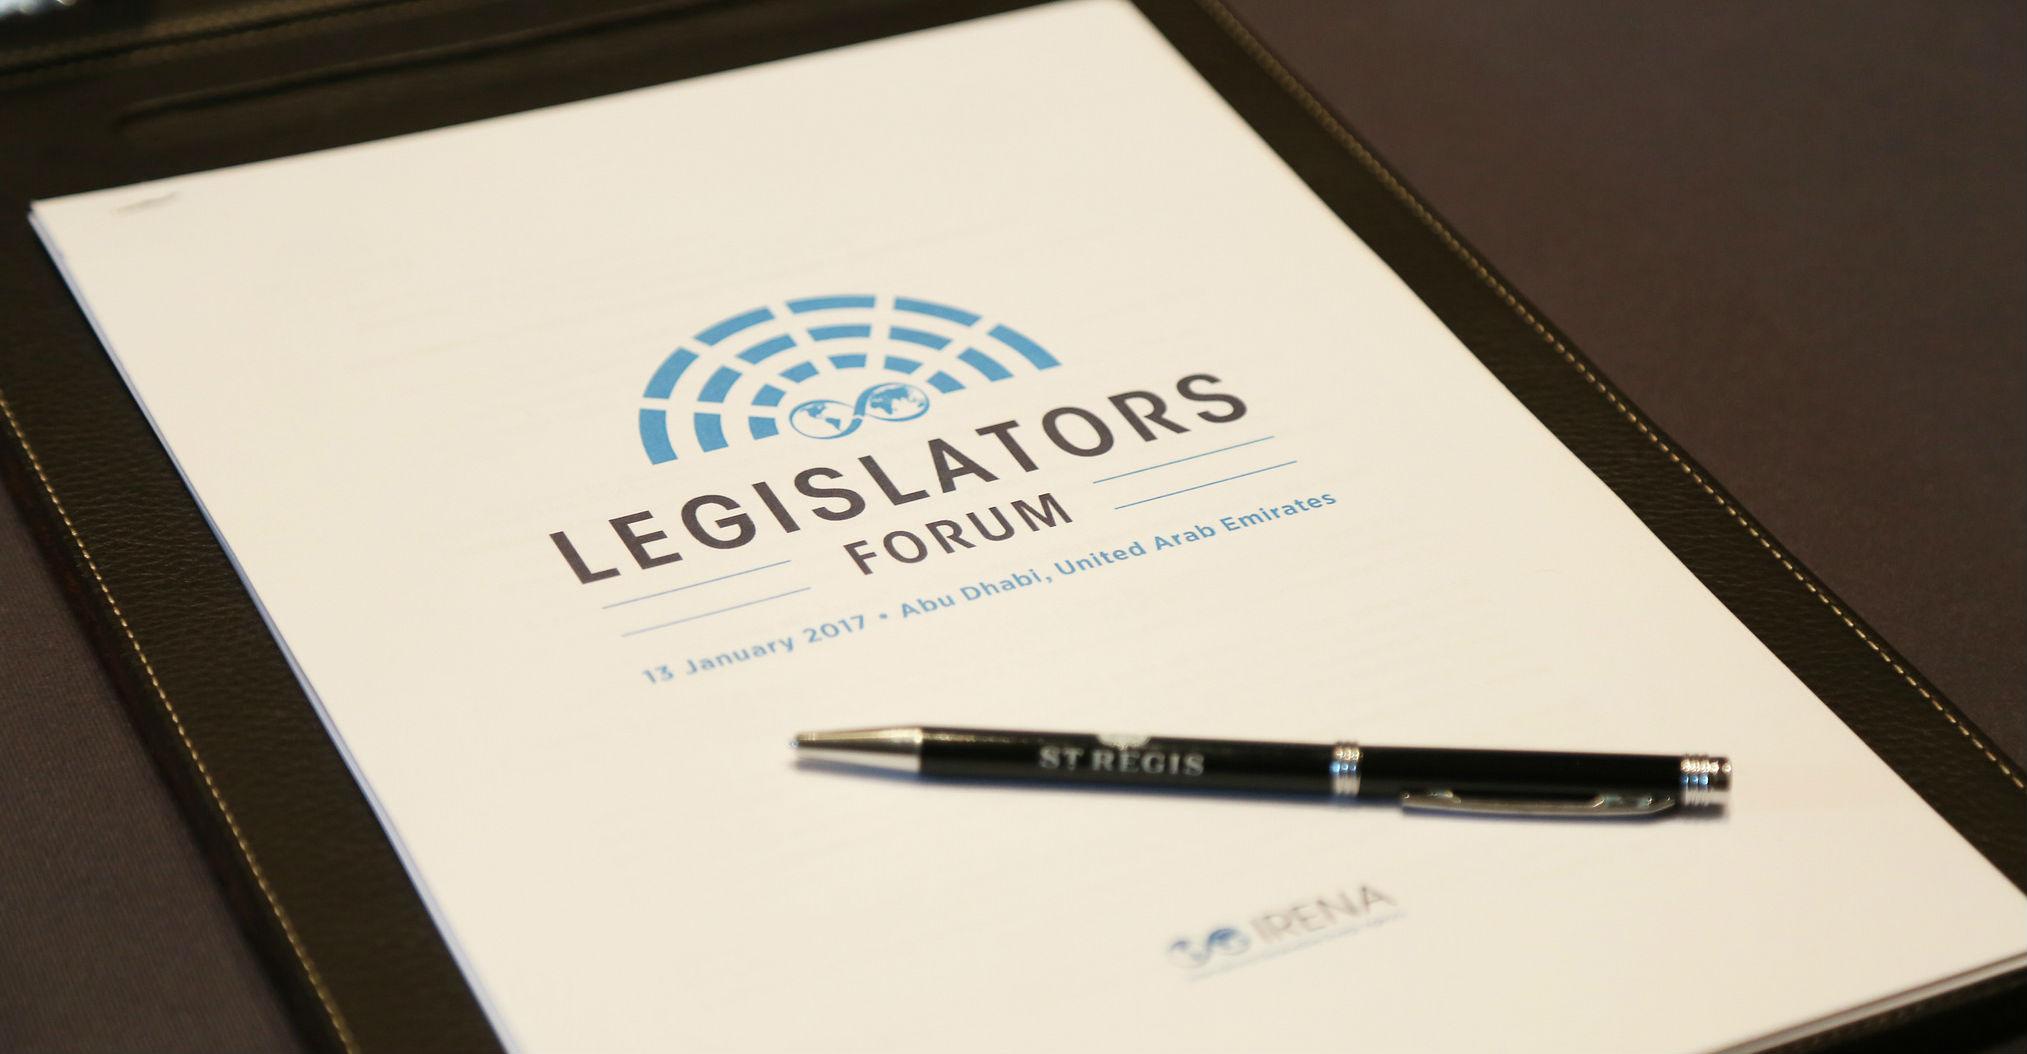 Today's Legislation for Tomorrow